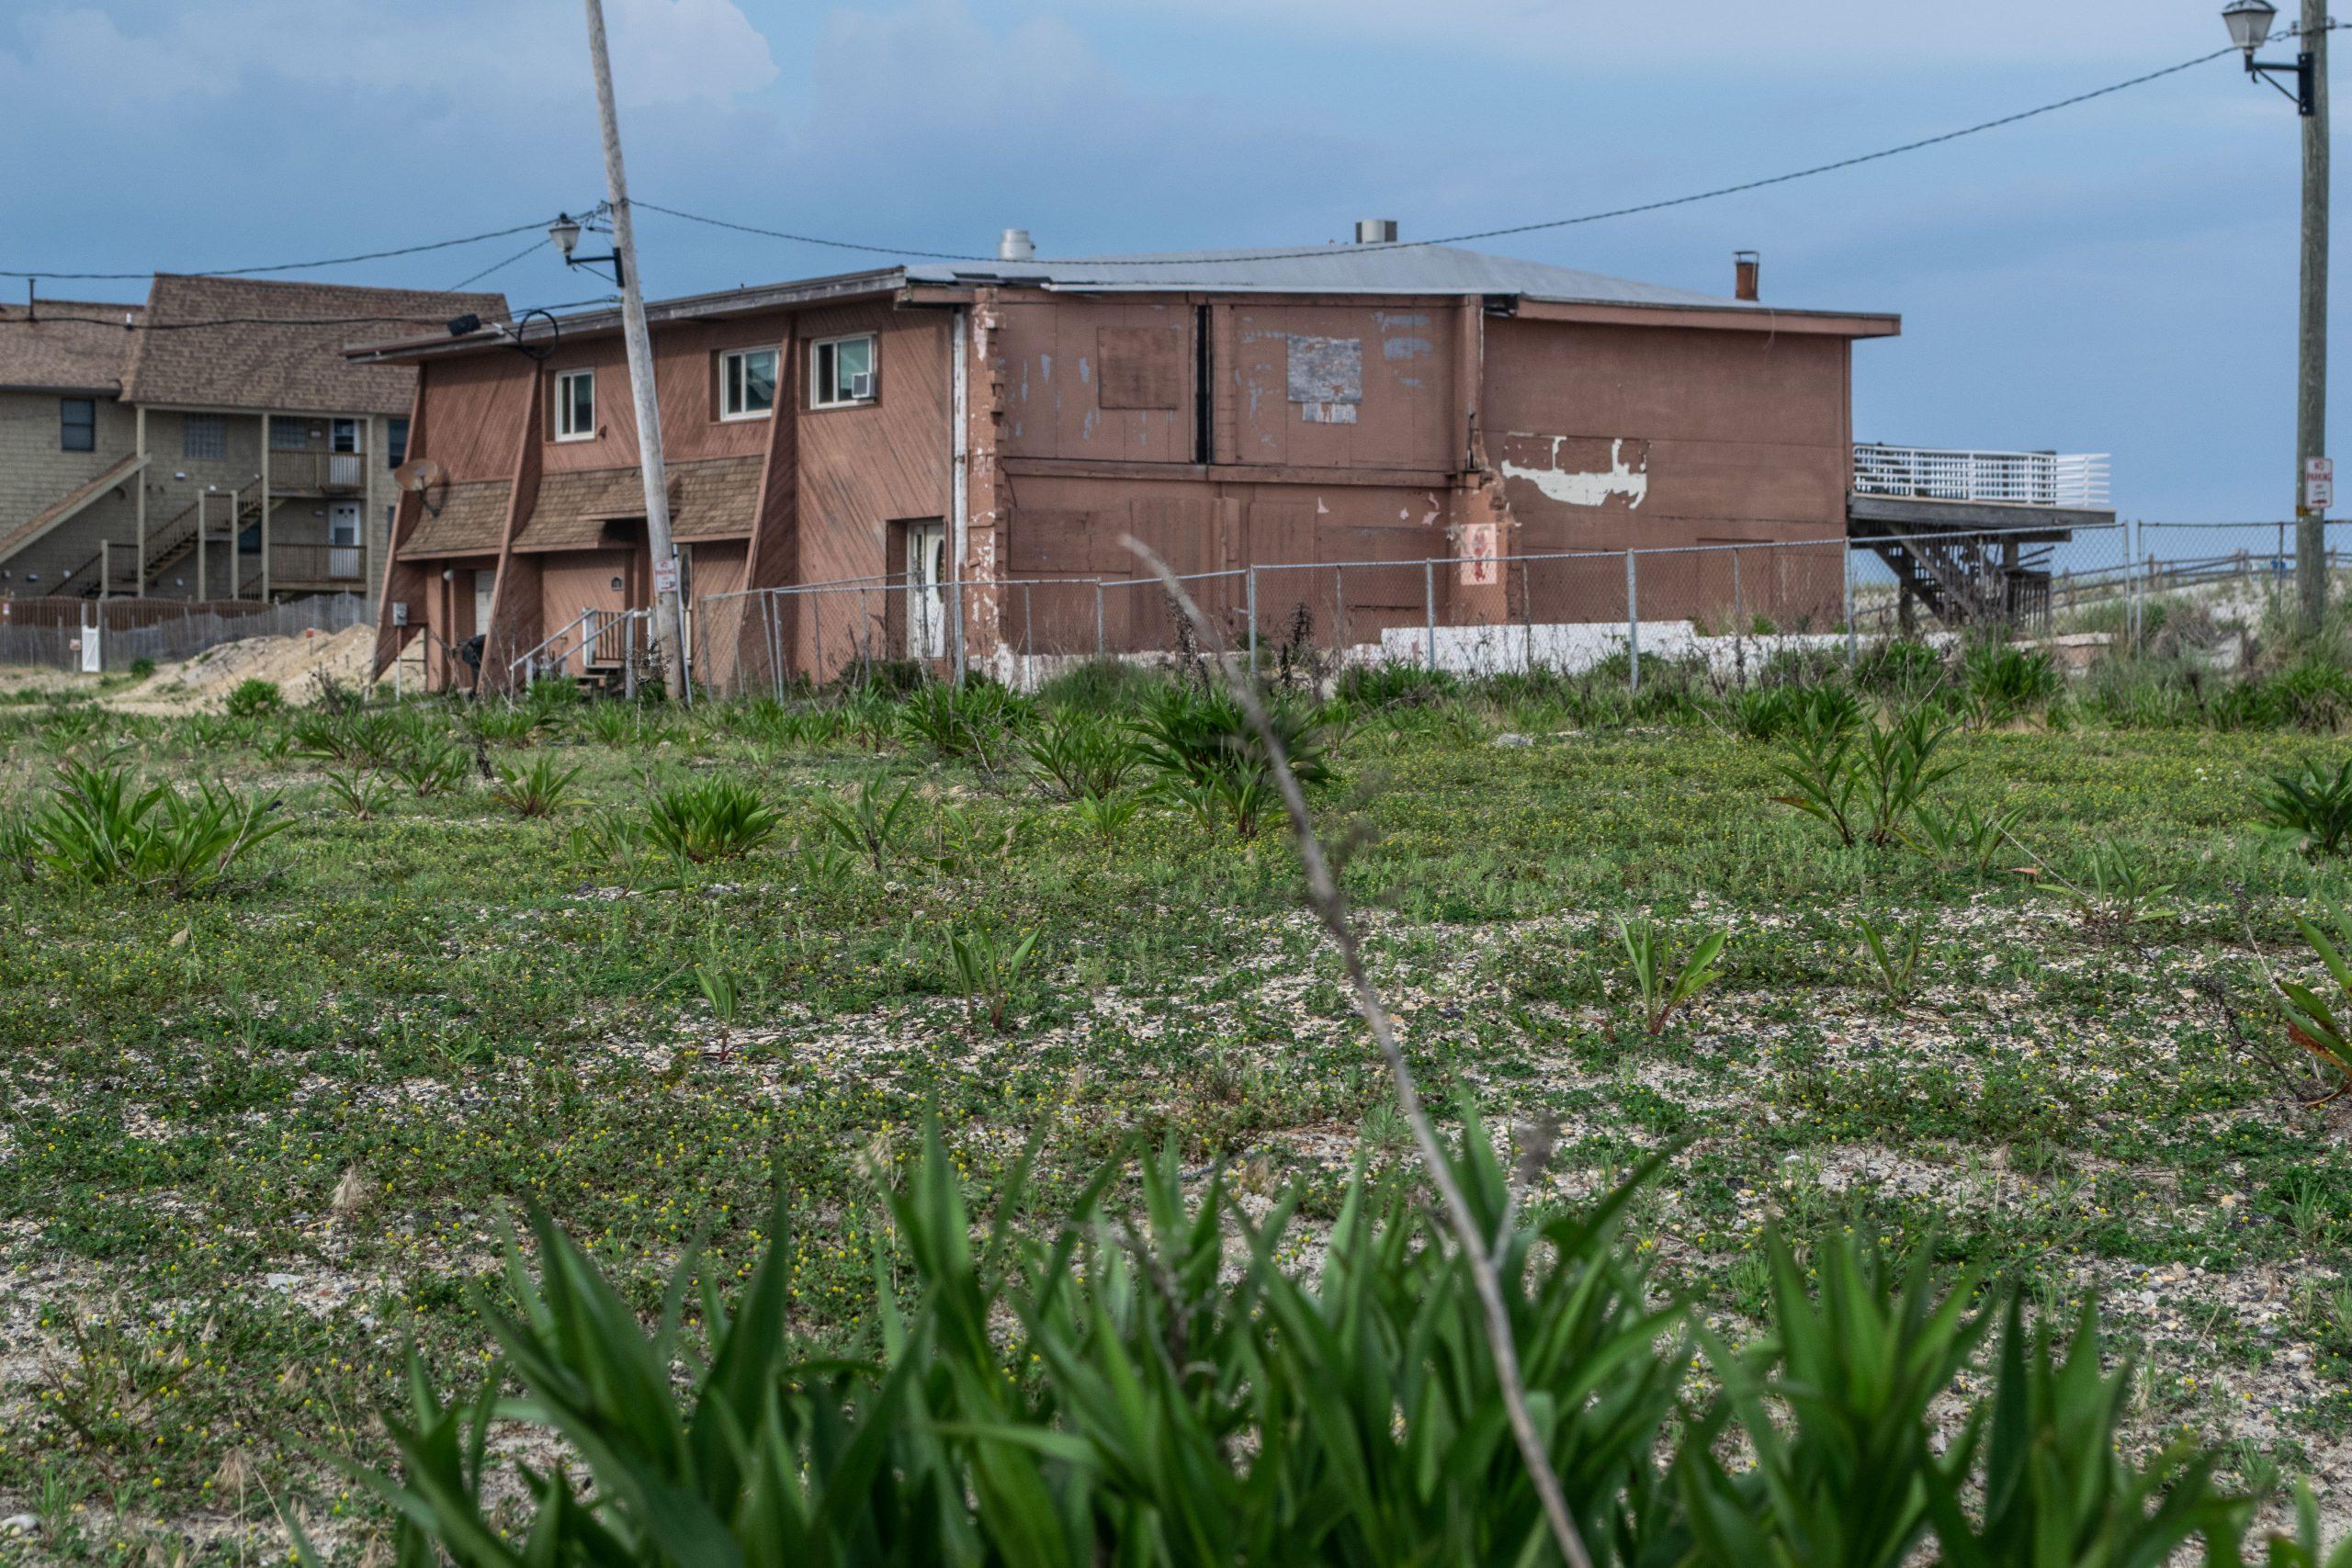 The former Joey Harrison's Surf Club property, Ortley Beach, N.J., June 2021. (Photo: Daniel Nee)